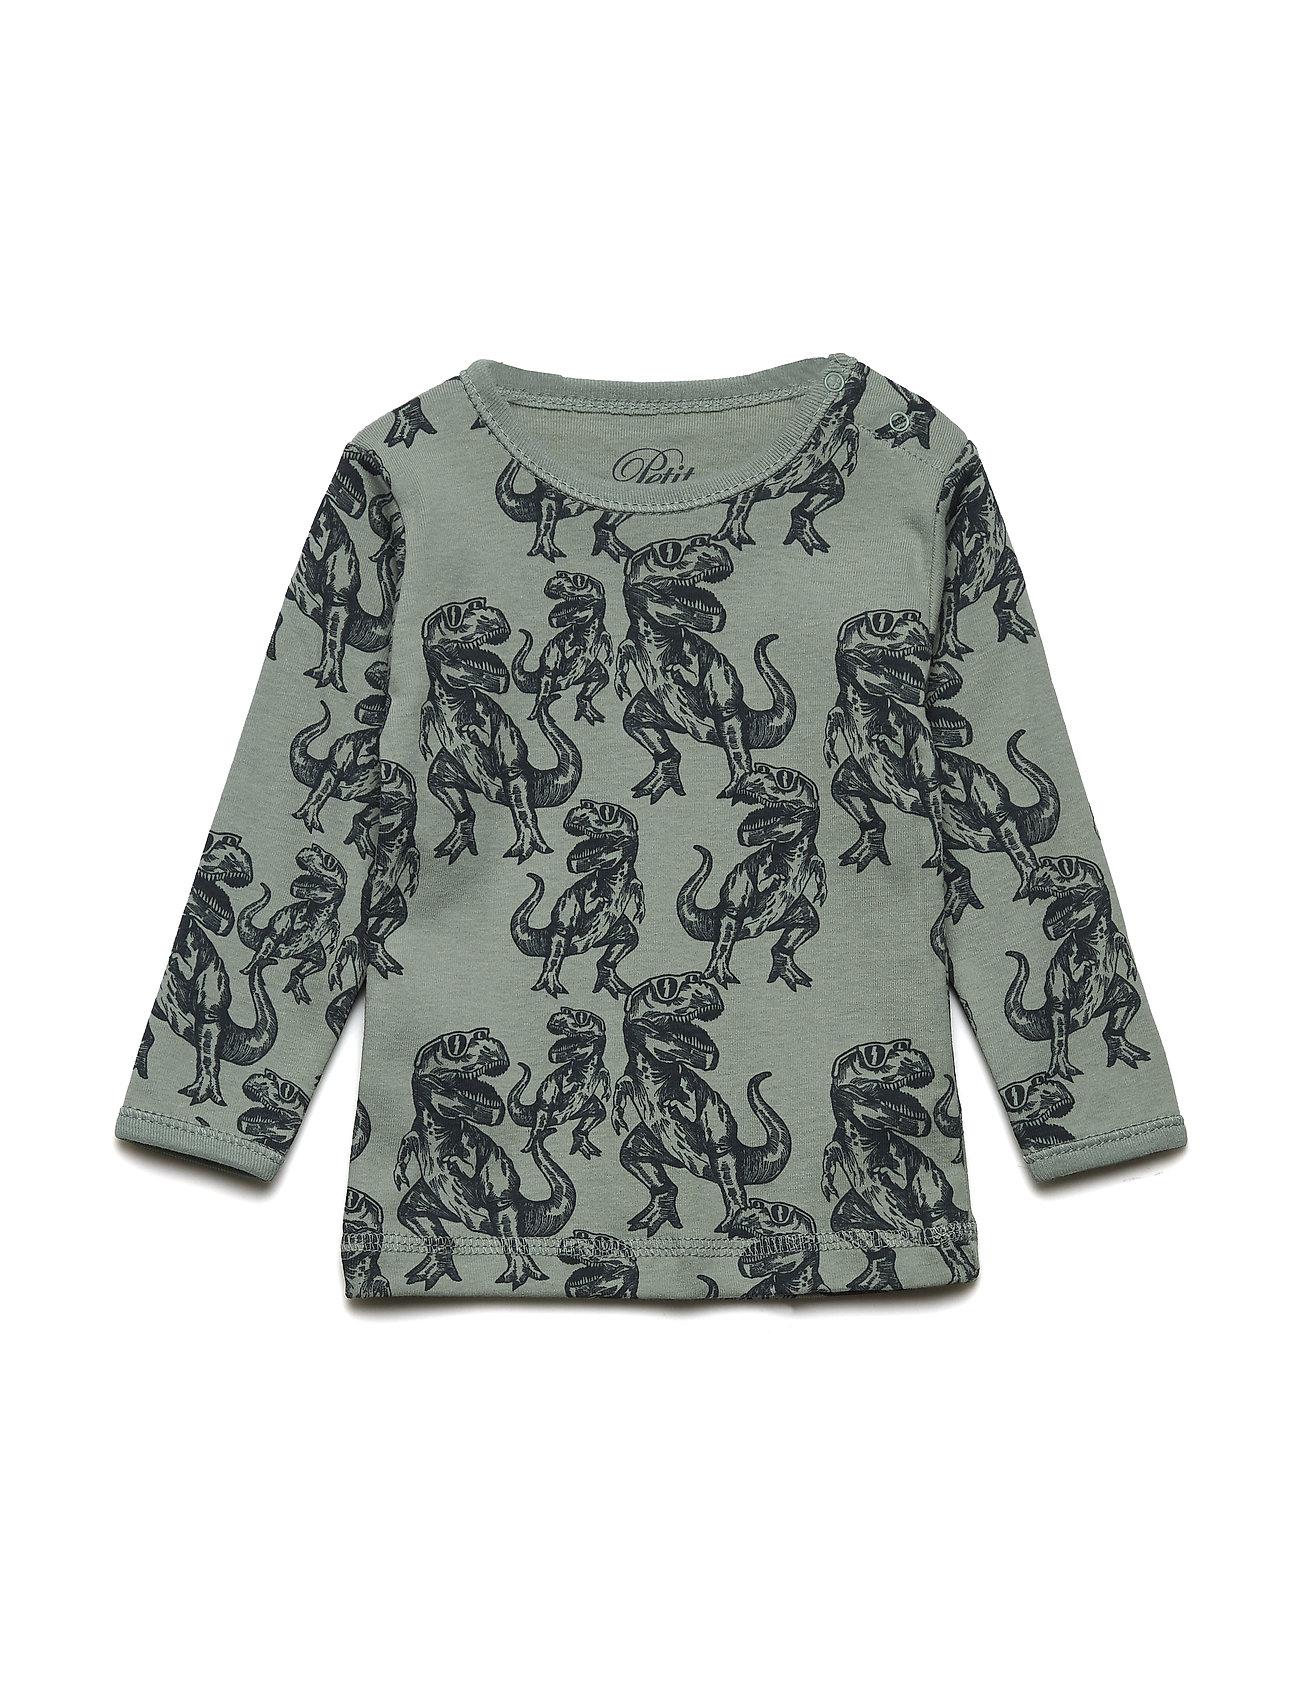 Petit by Sofie Schnoor T-shirt long sleeve - DINO PRINT